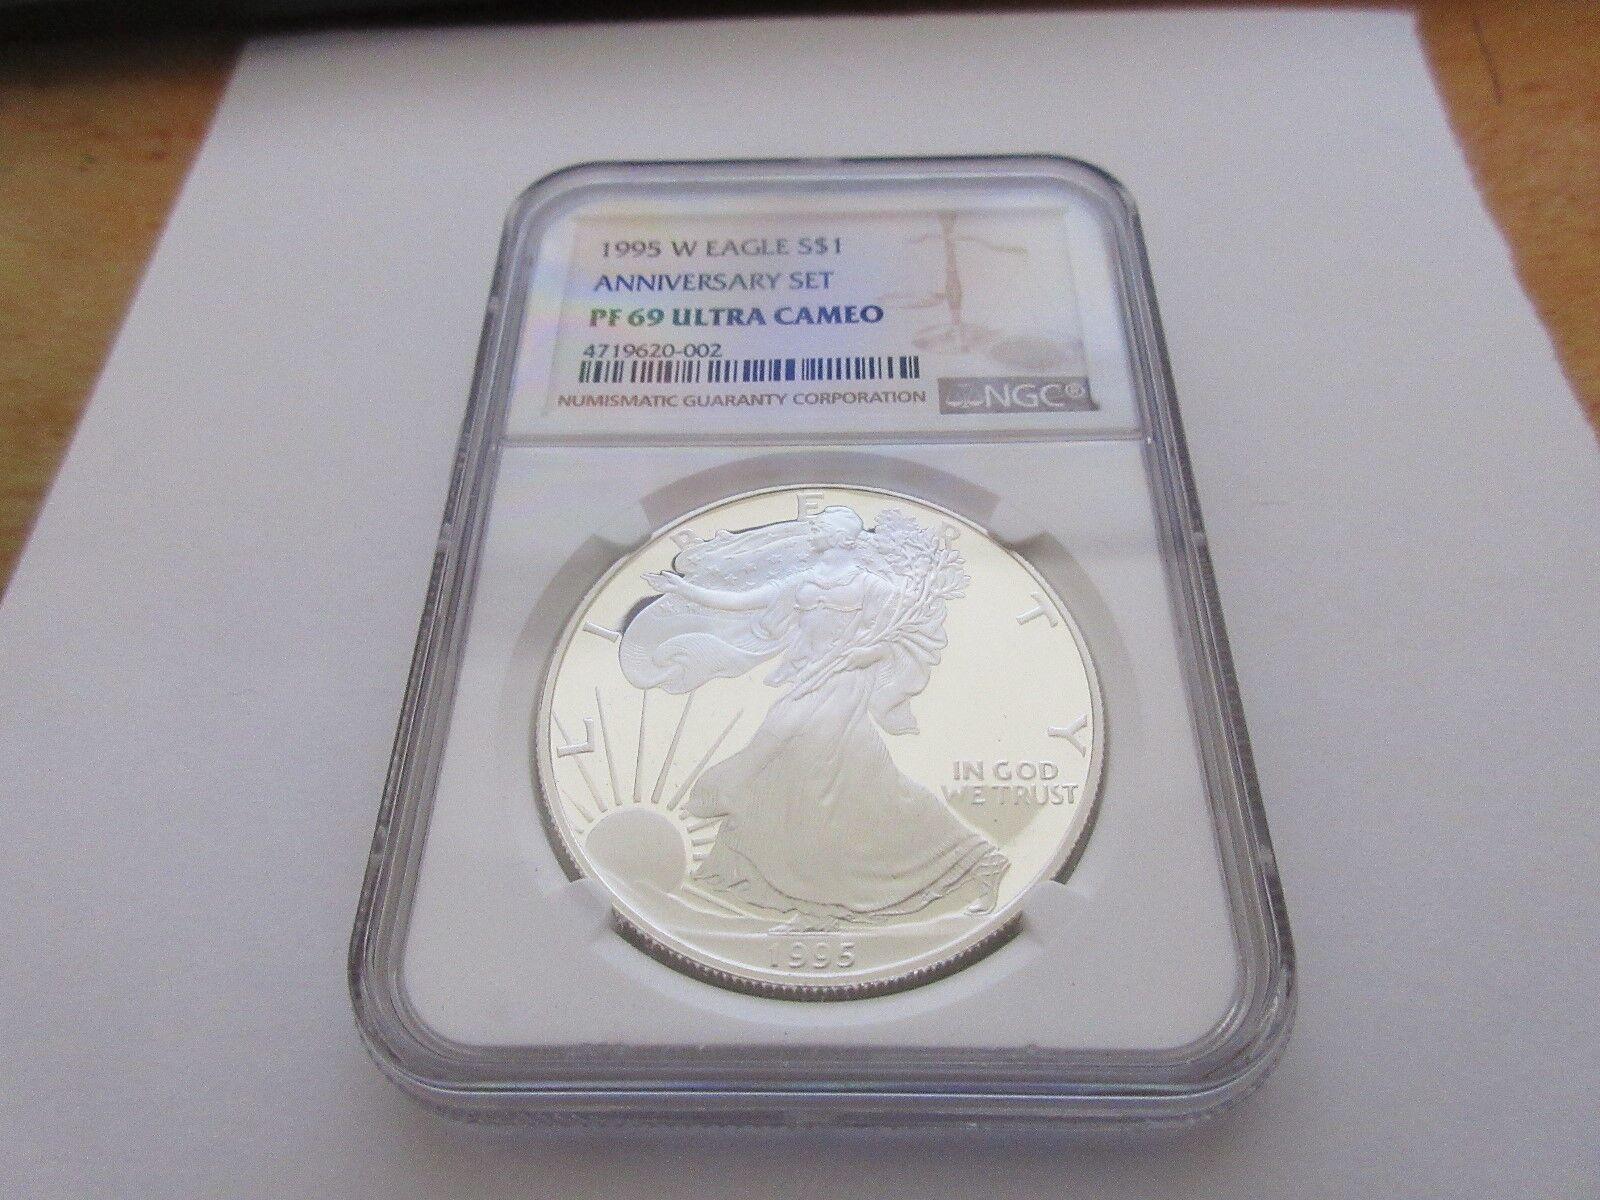 1995-W Proof $1 American Silver Eagle NGC PF-69 Ultra C